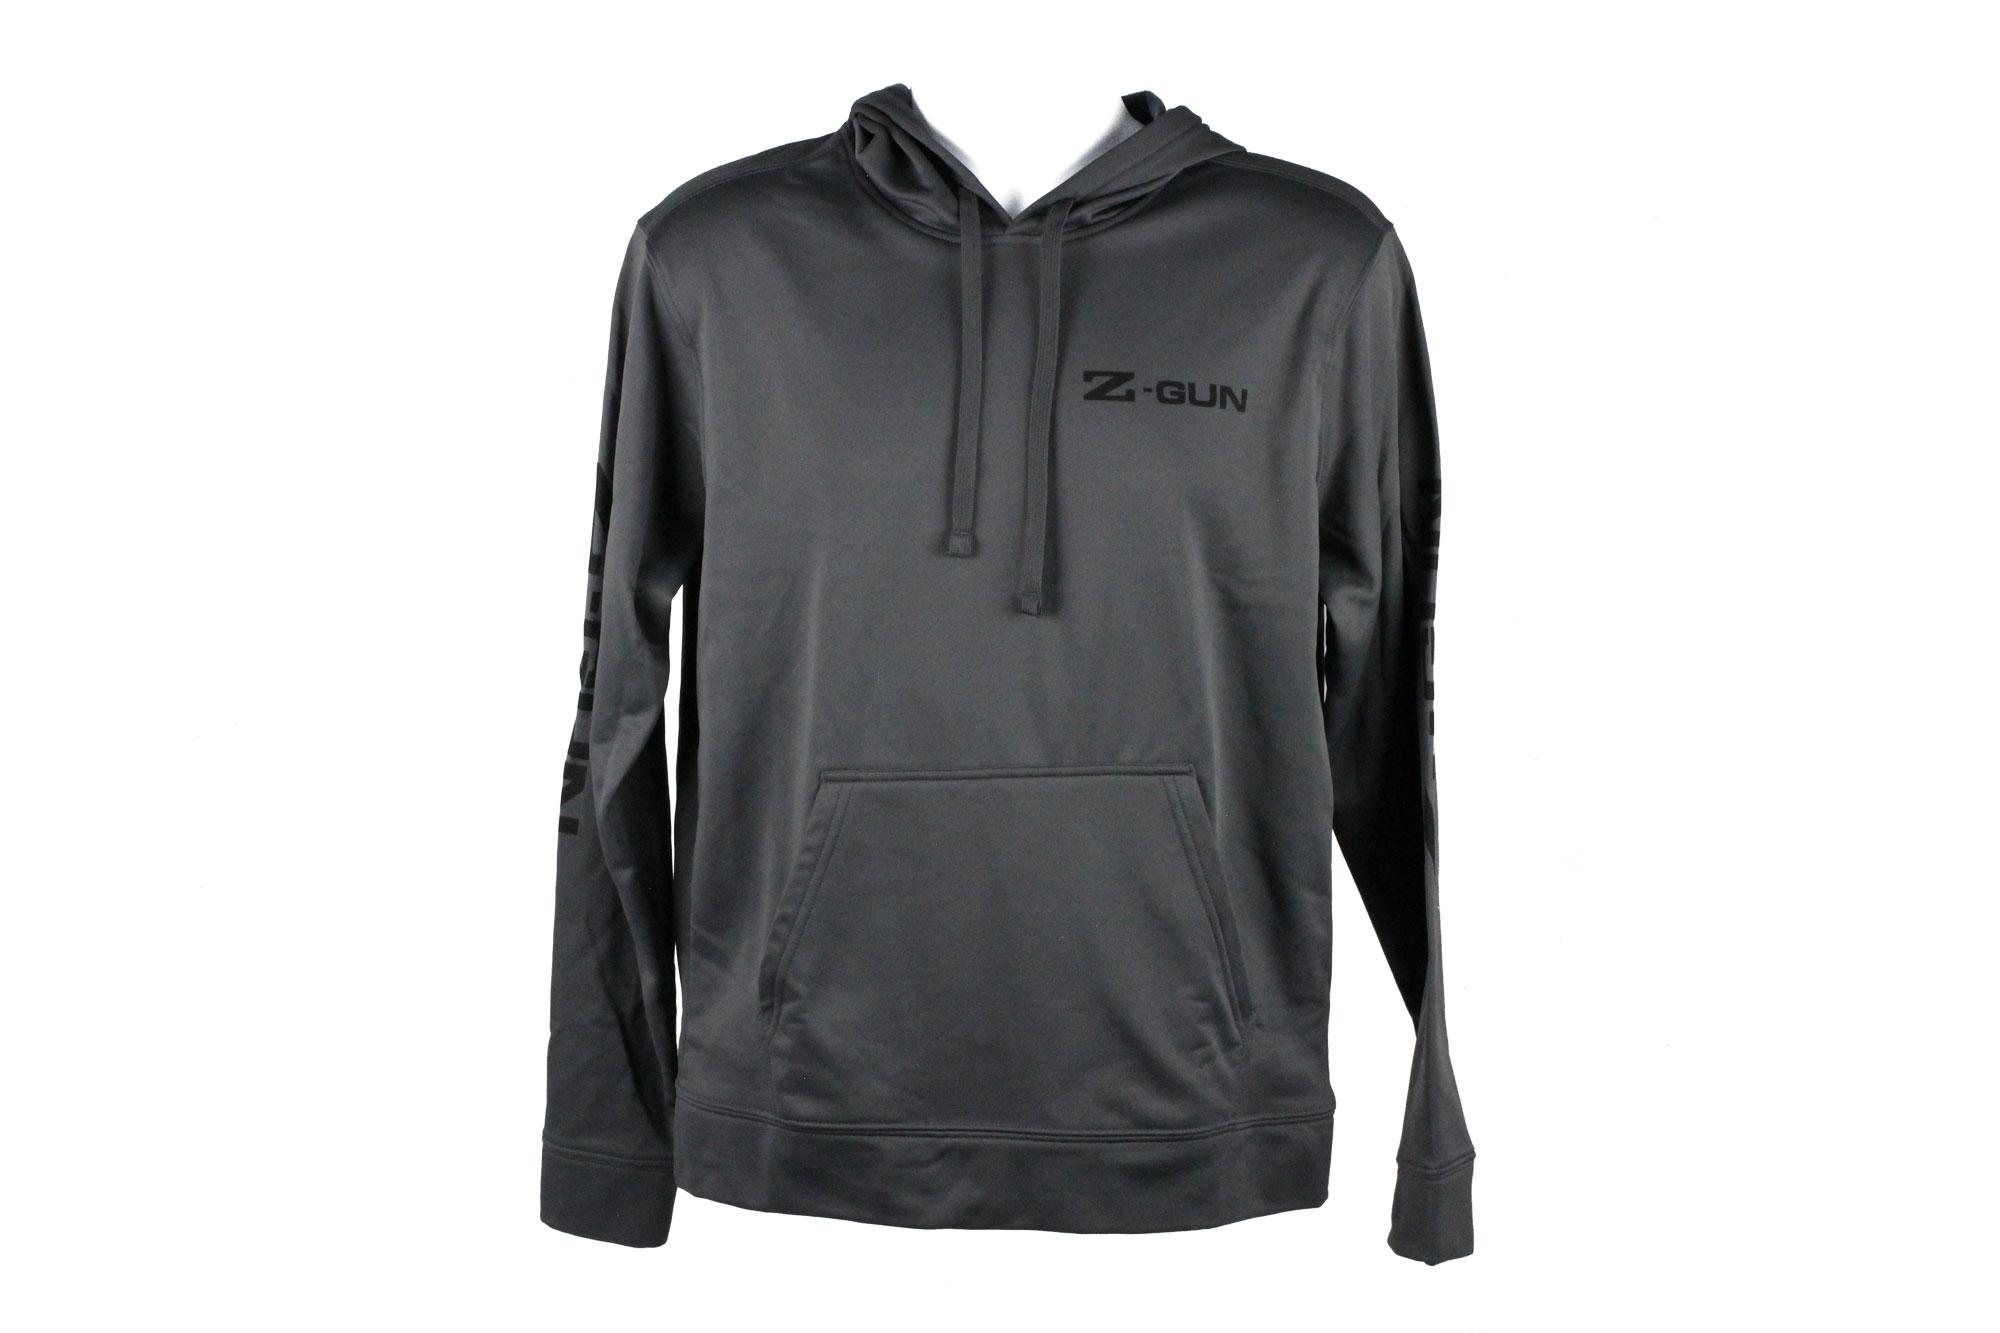 Z-GUN Grey Sweatshirt